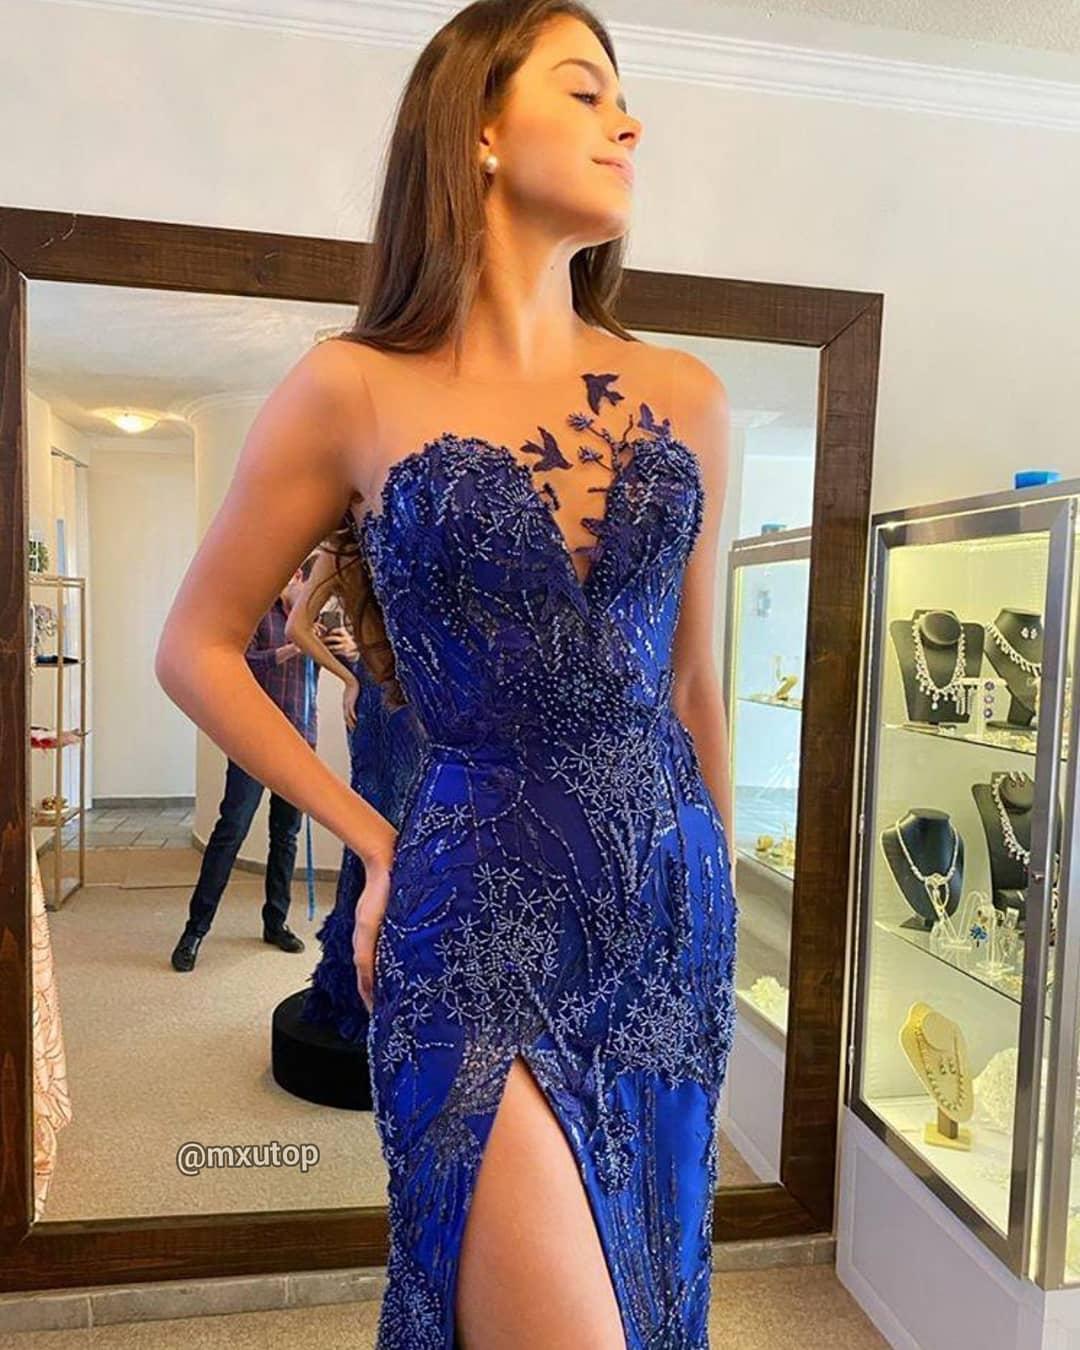 regina peredo, reyna hispanoamericana 2019. - Página 9 83820310